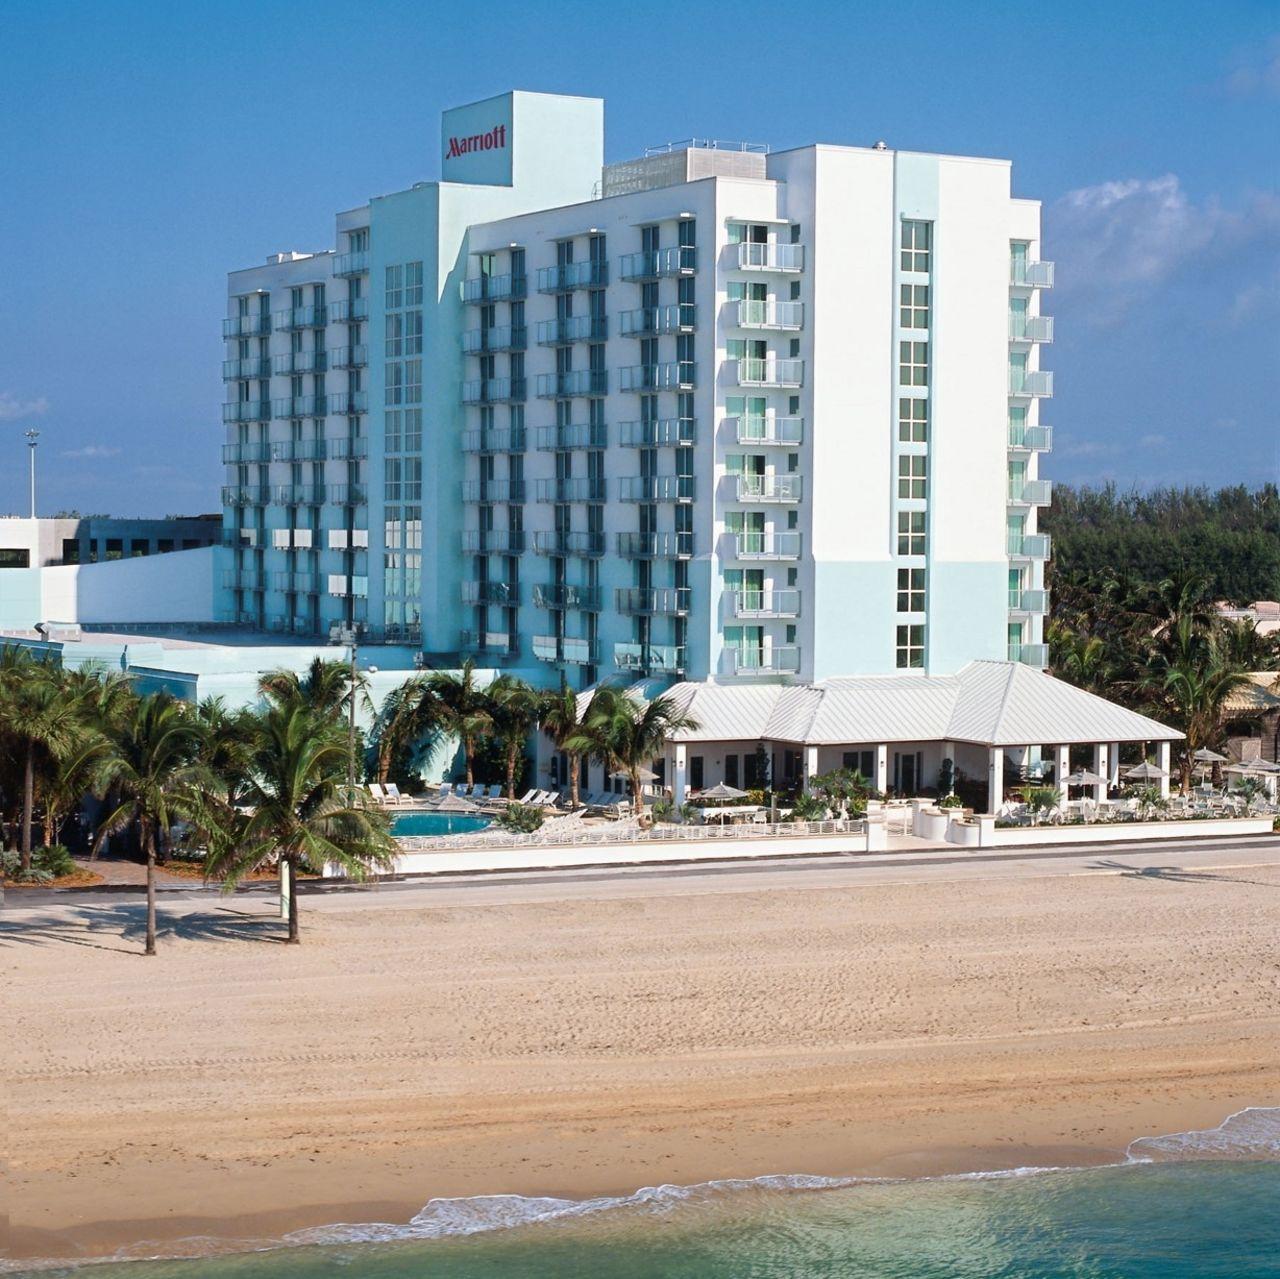 hotel florida hollywood beach marriott hotel canusa. Black Bedroom Furniture Sets. Home Design Ideas